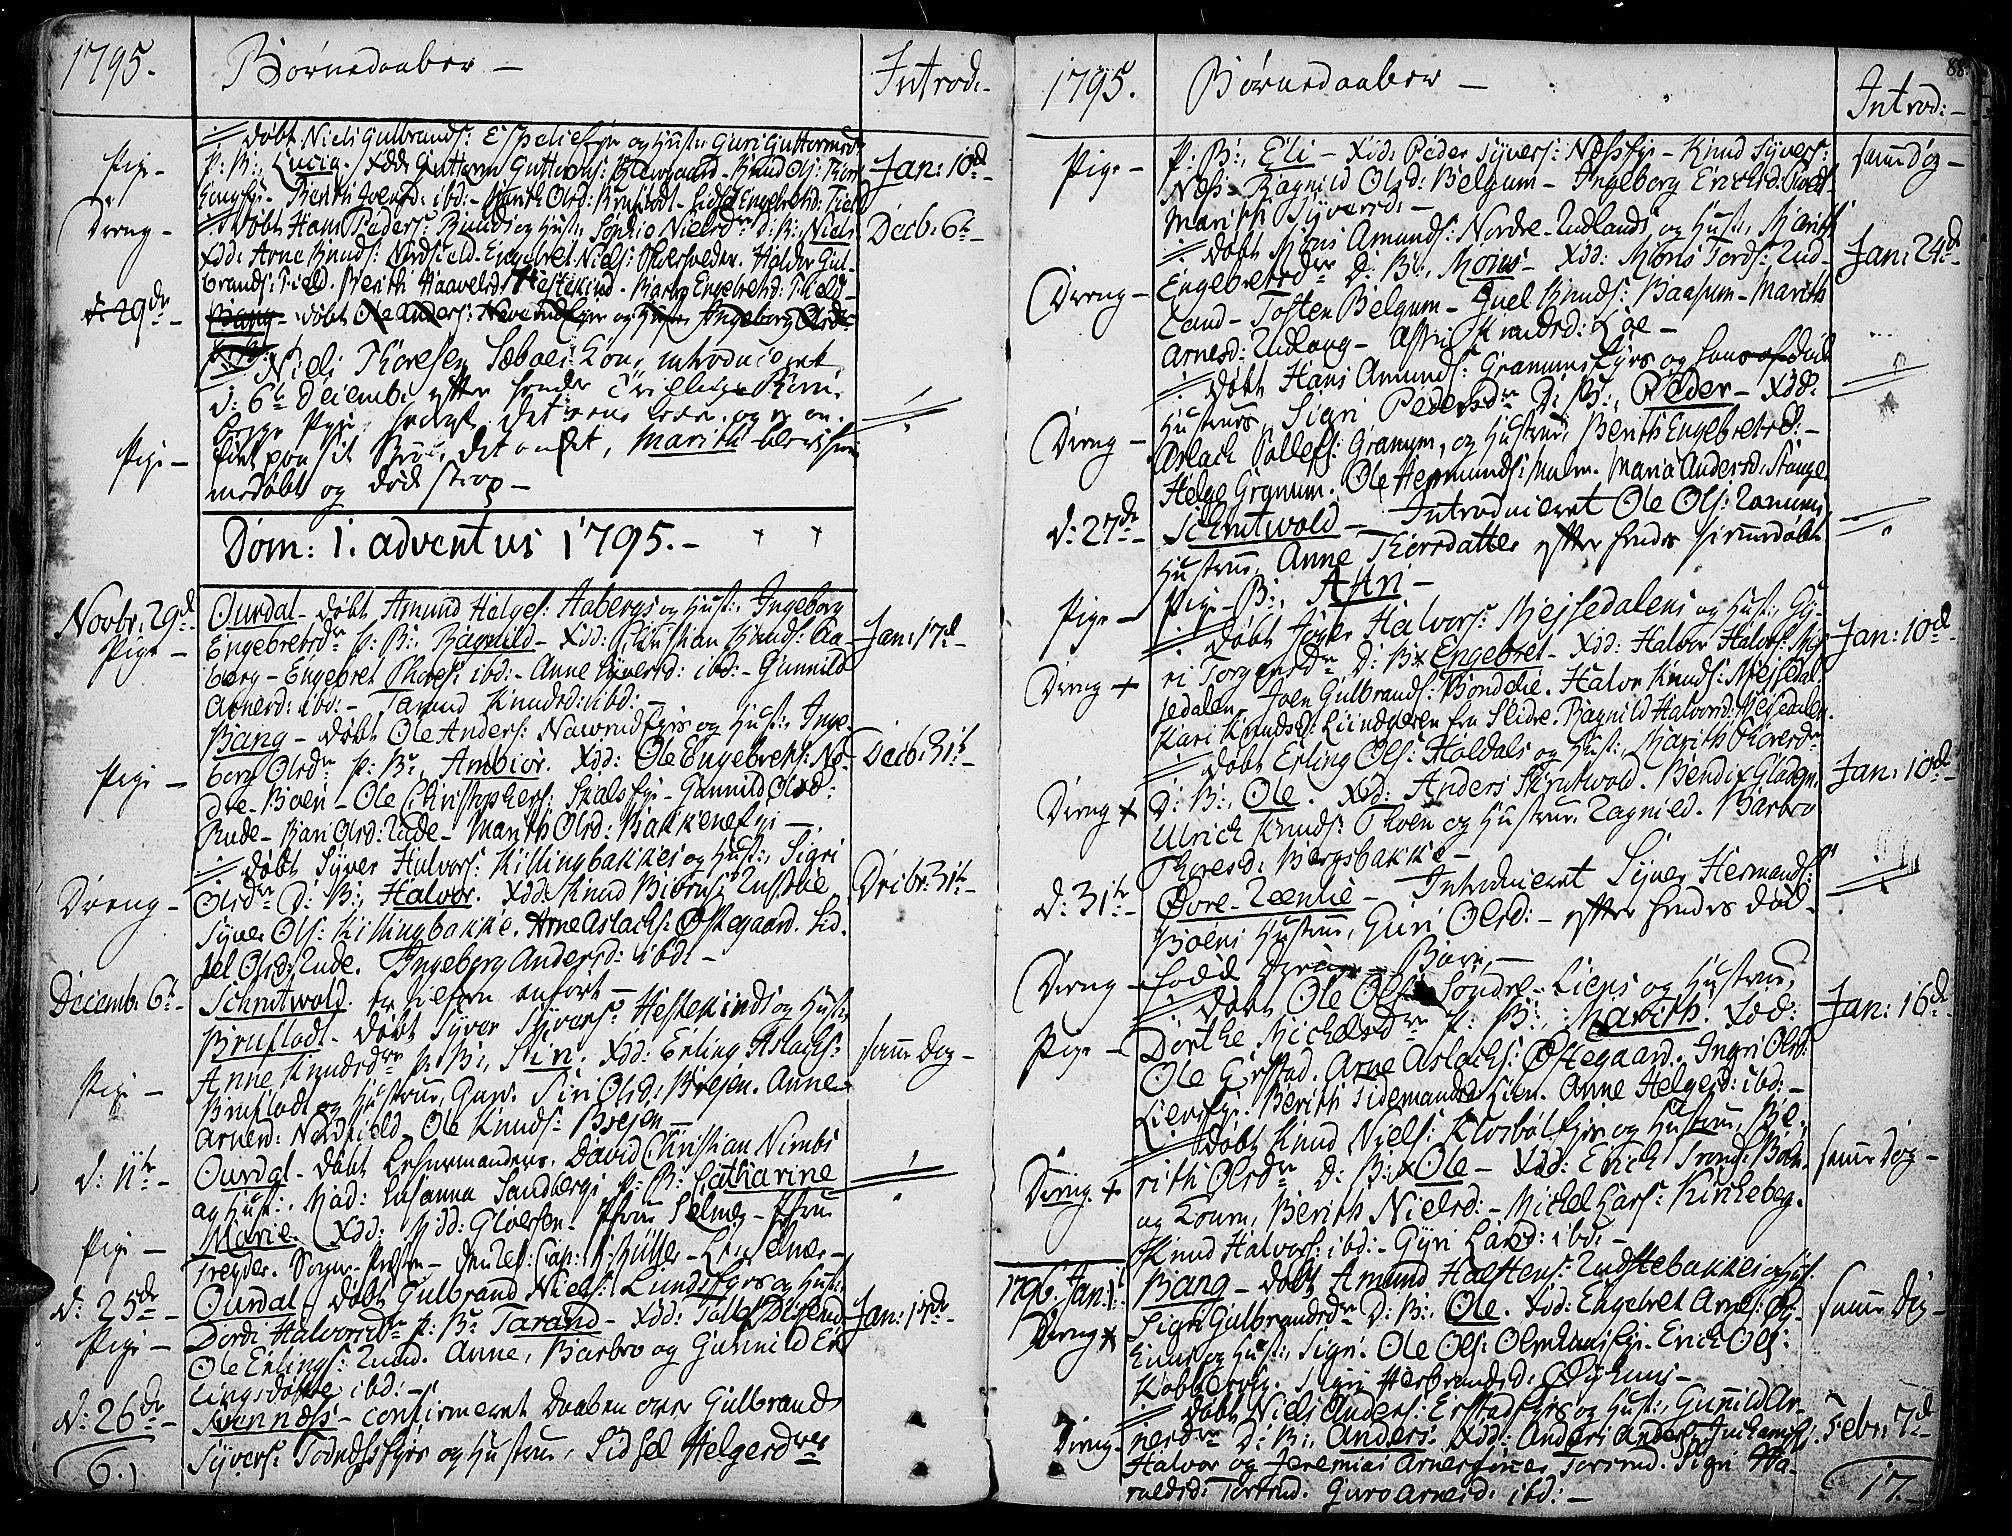 SAH, Aurdal prestekontor, Ministerialbok nr. 6, 1781-1804, s. 88